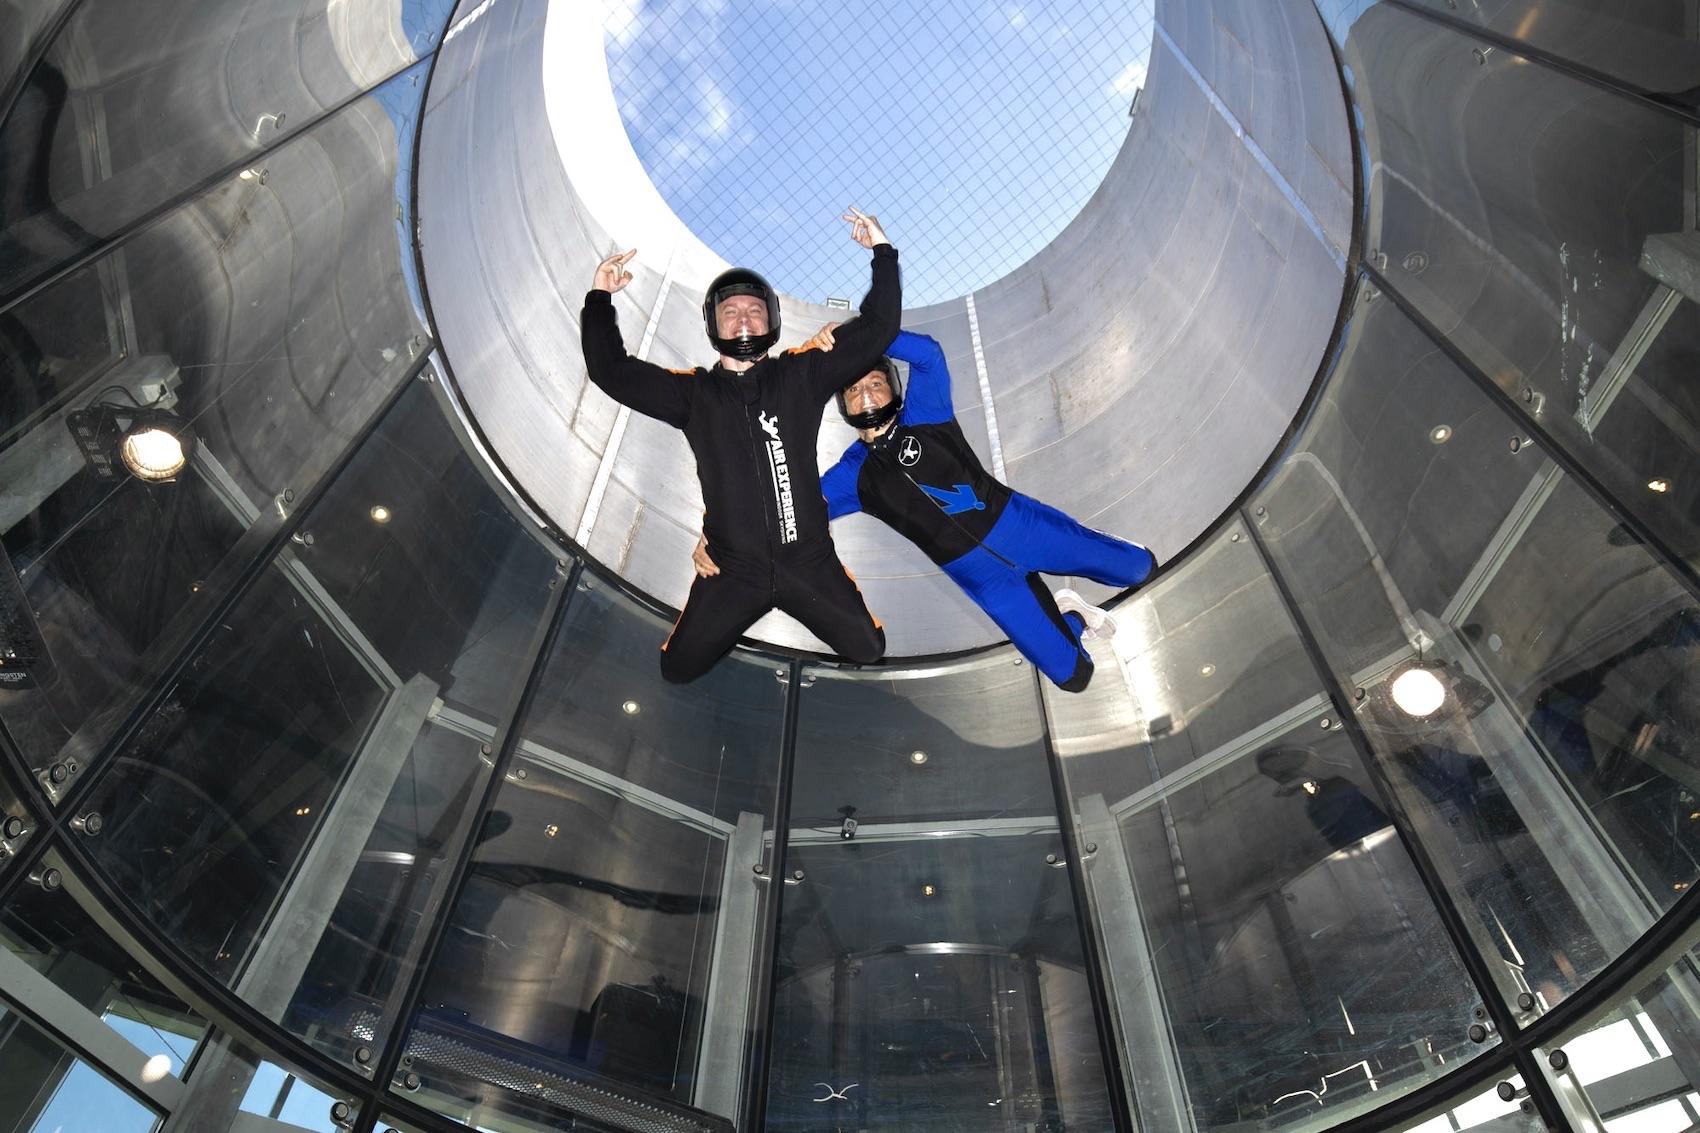 Den vildeste blå mandag Indoor Skydiving hos Copenhagen Air Experience